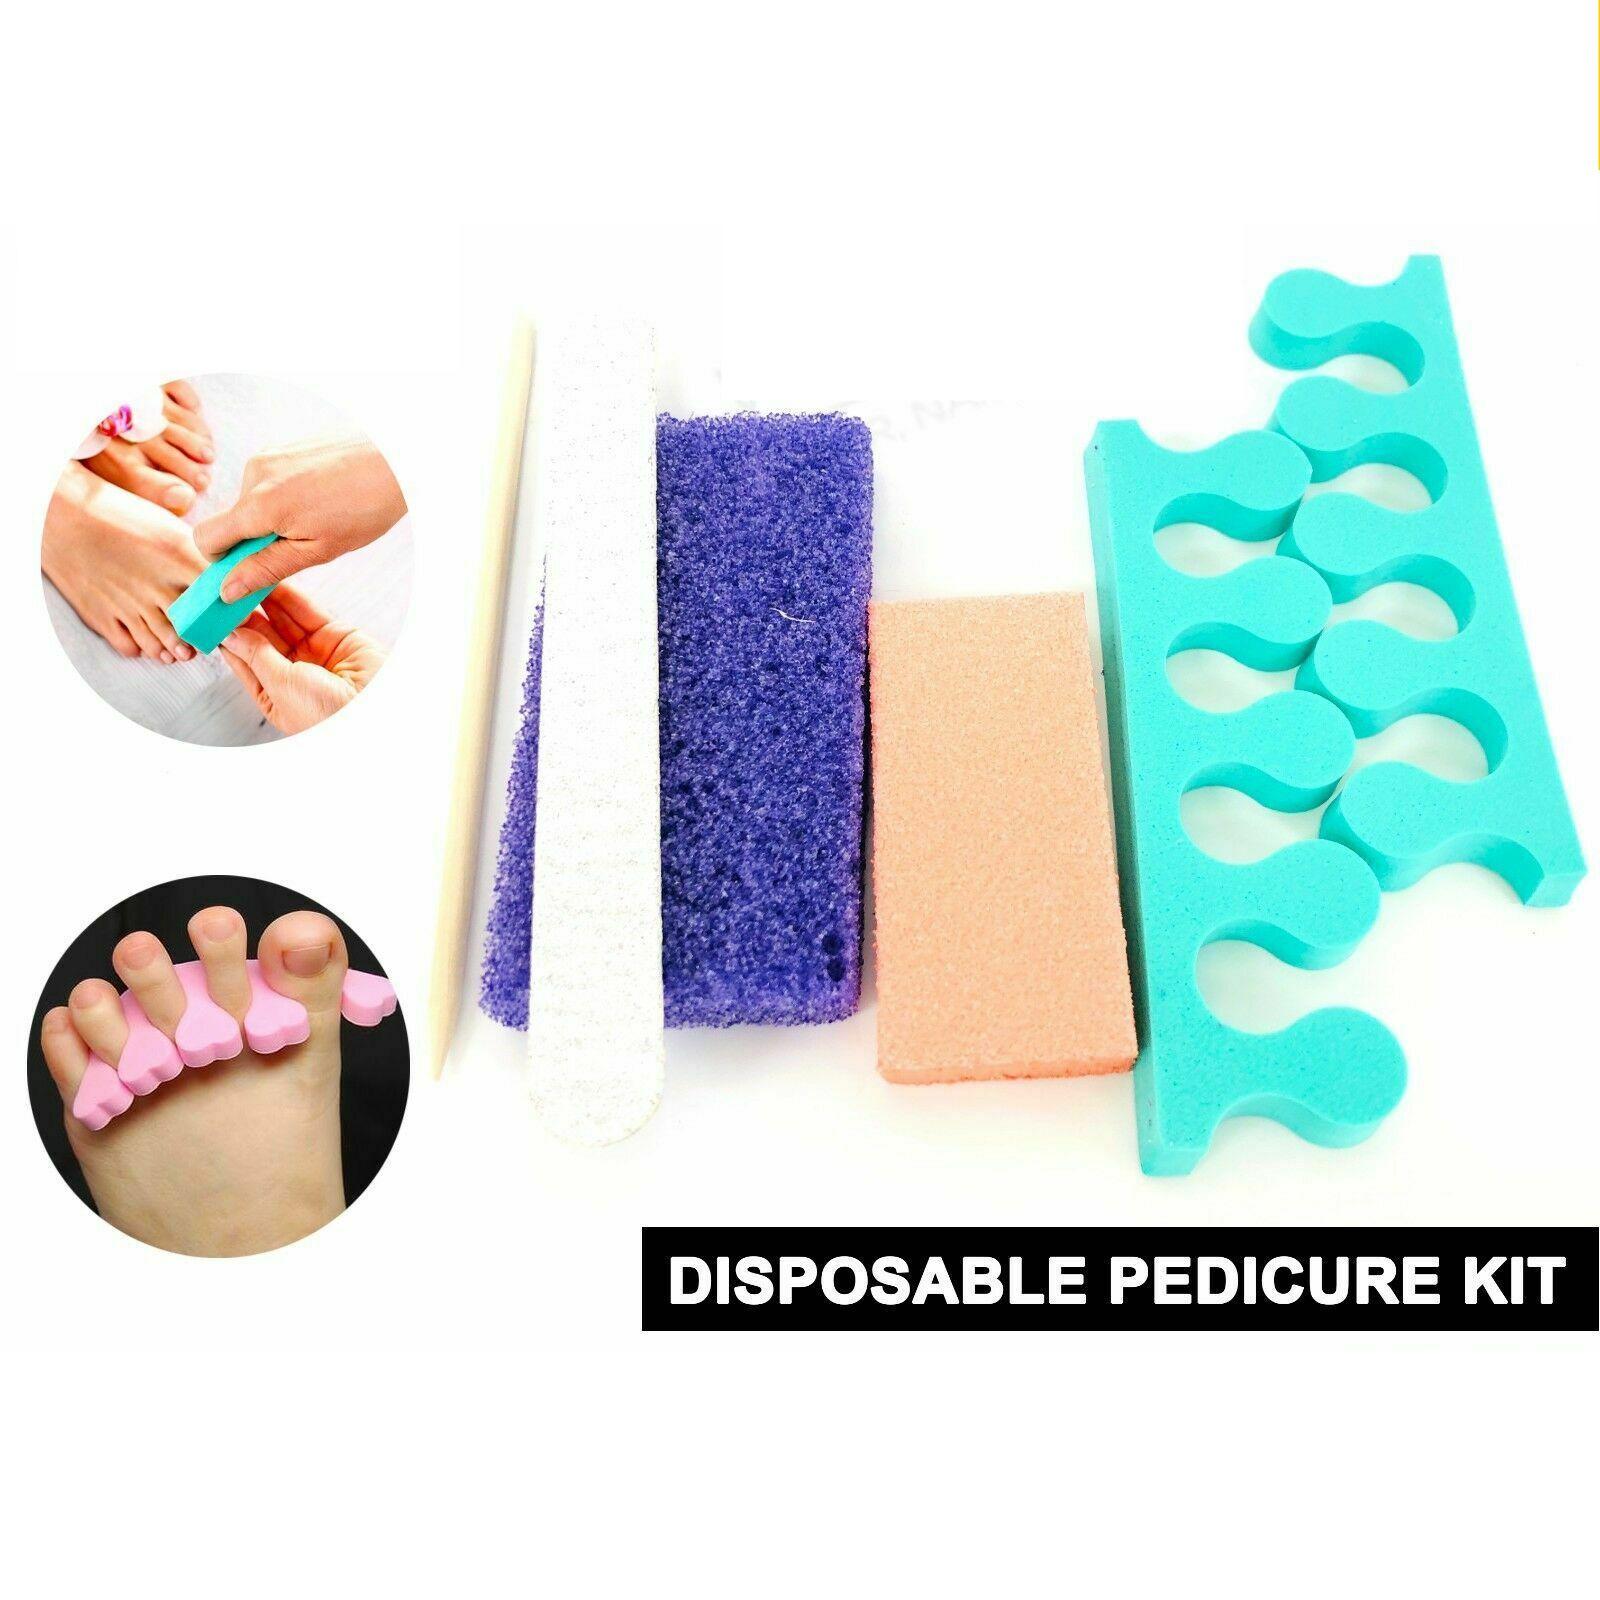 Pediküre Fusspflege Einweg Set Hygienisch verpackt